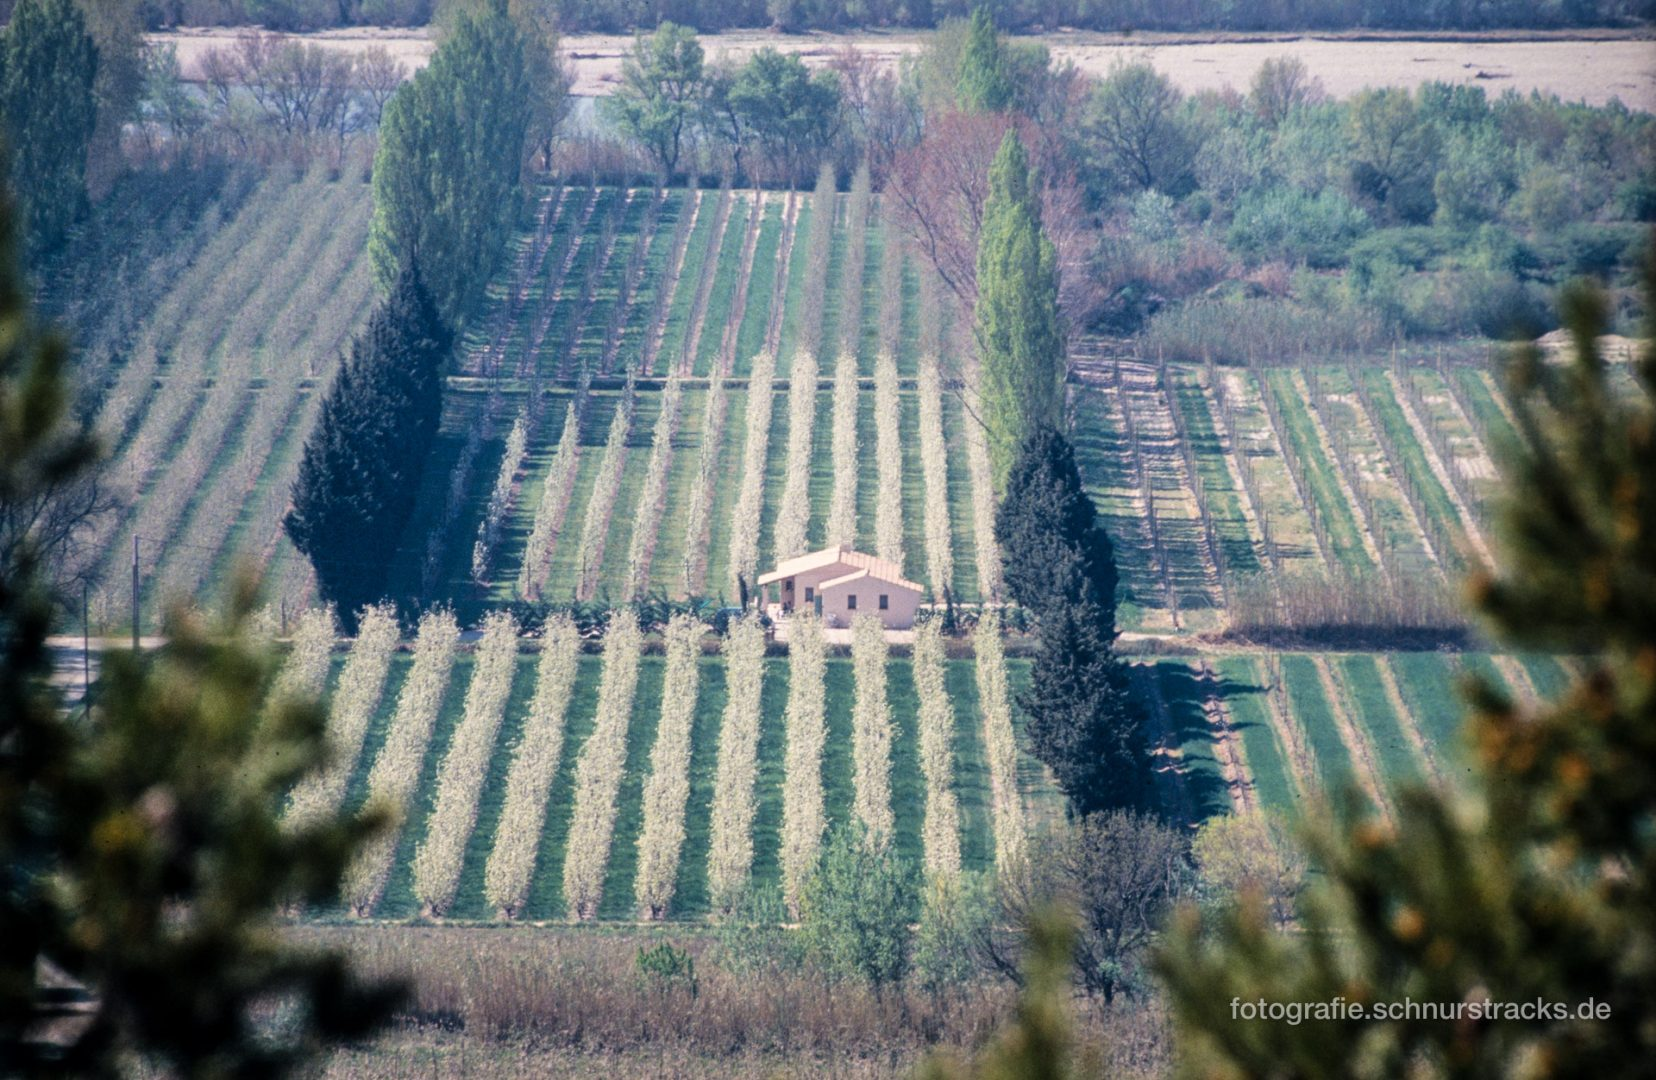 Provence - Obstanbau an der Durance bei Cavaillon #0641